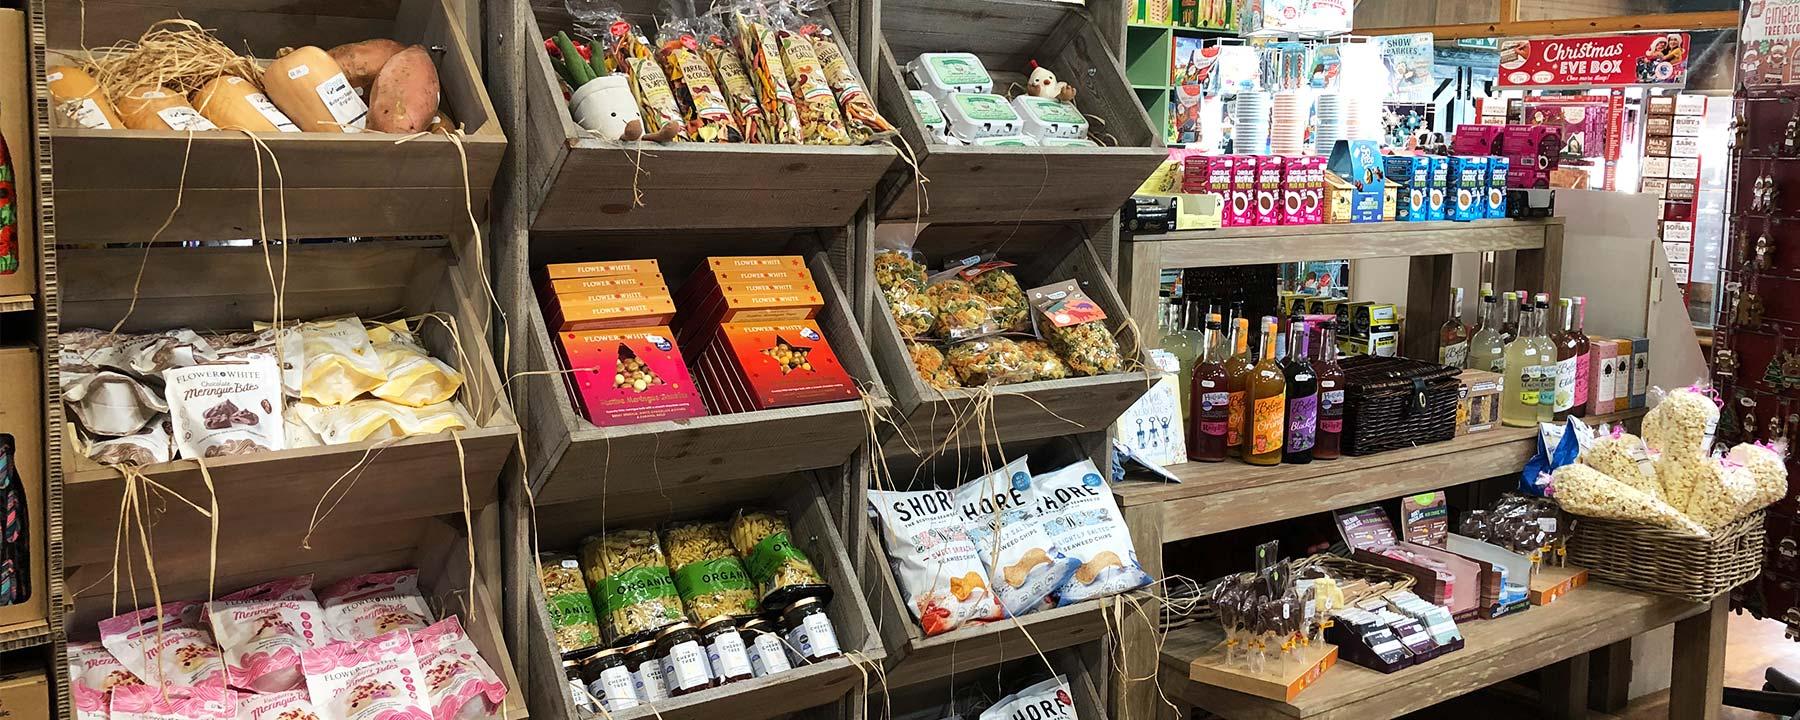 marmalades farm shop